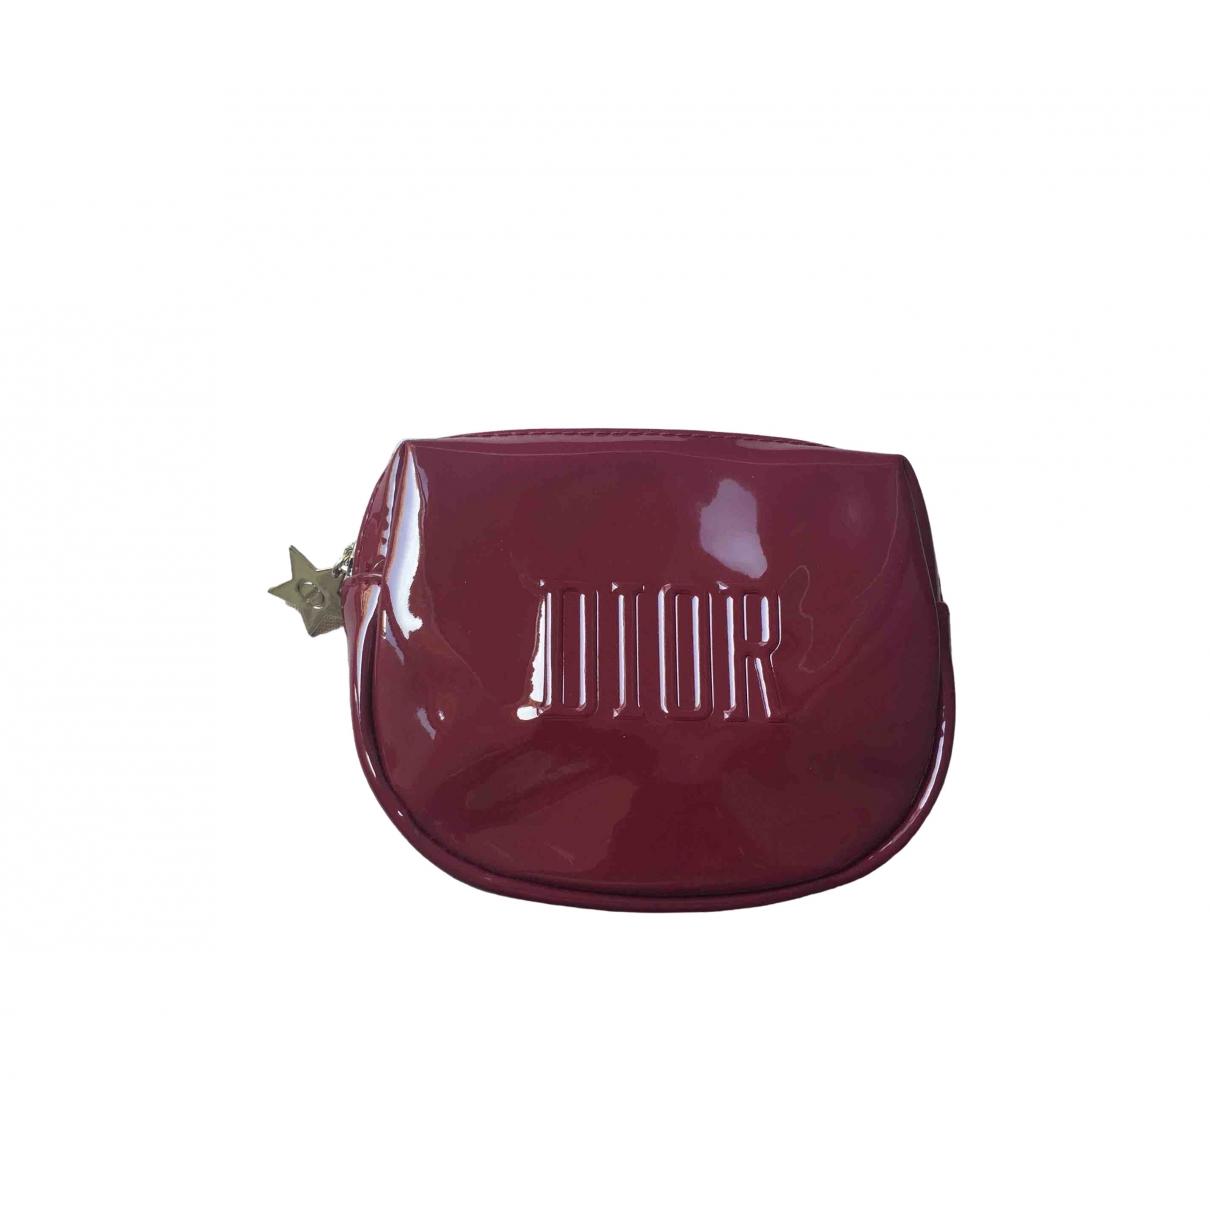 Dior \N Purple Travel bag for Women \N